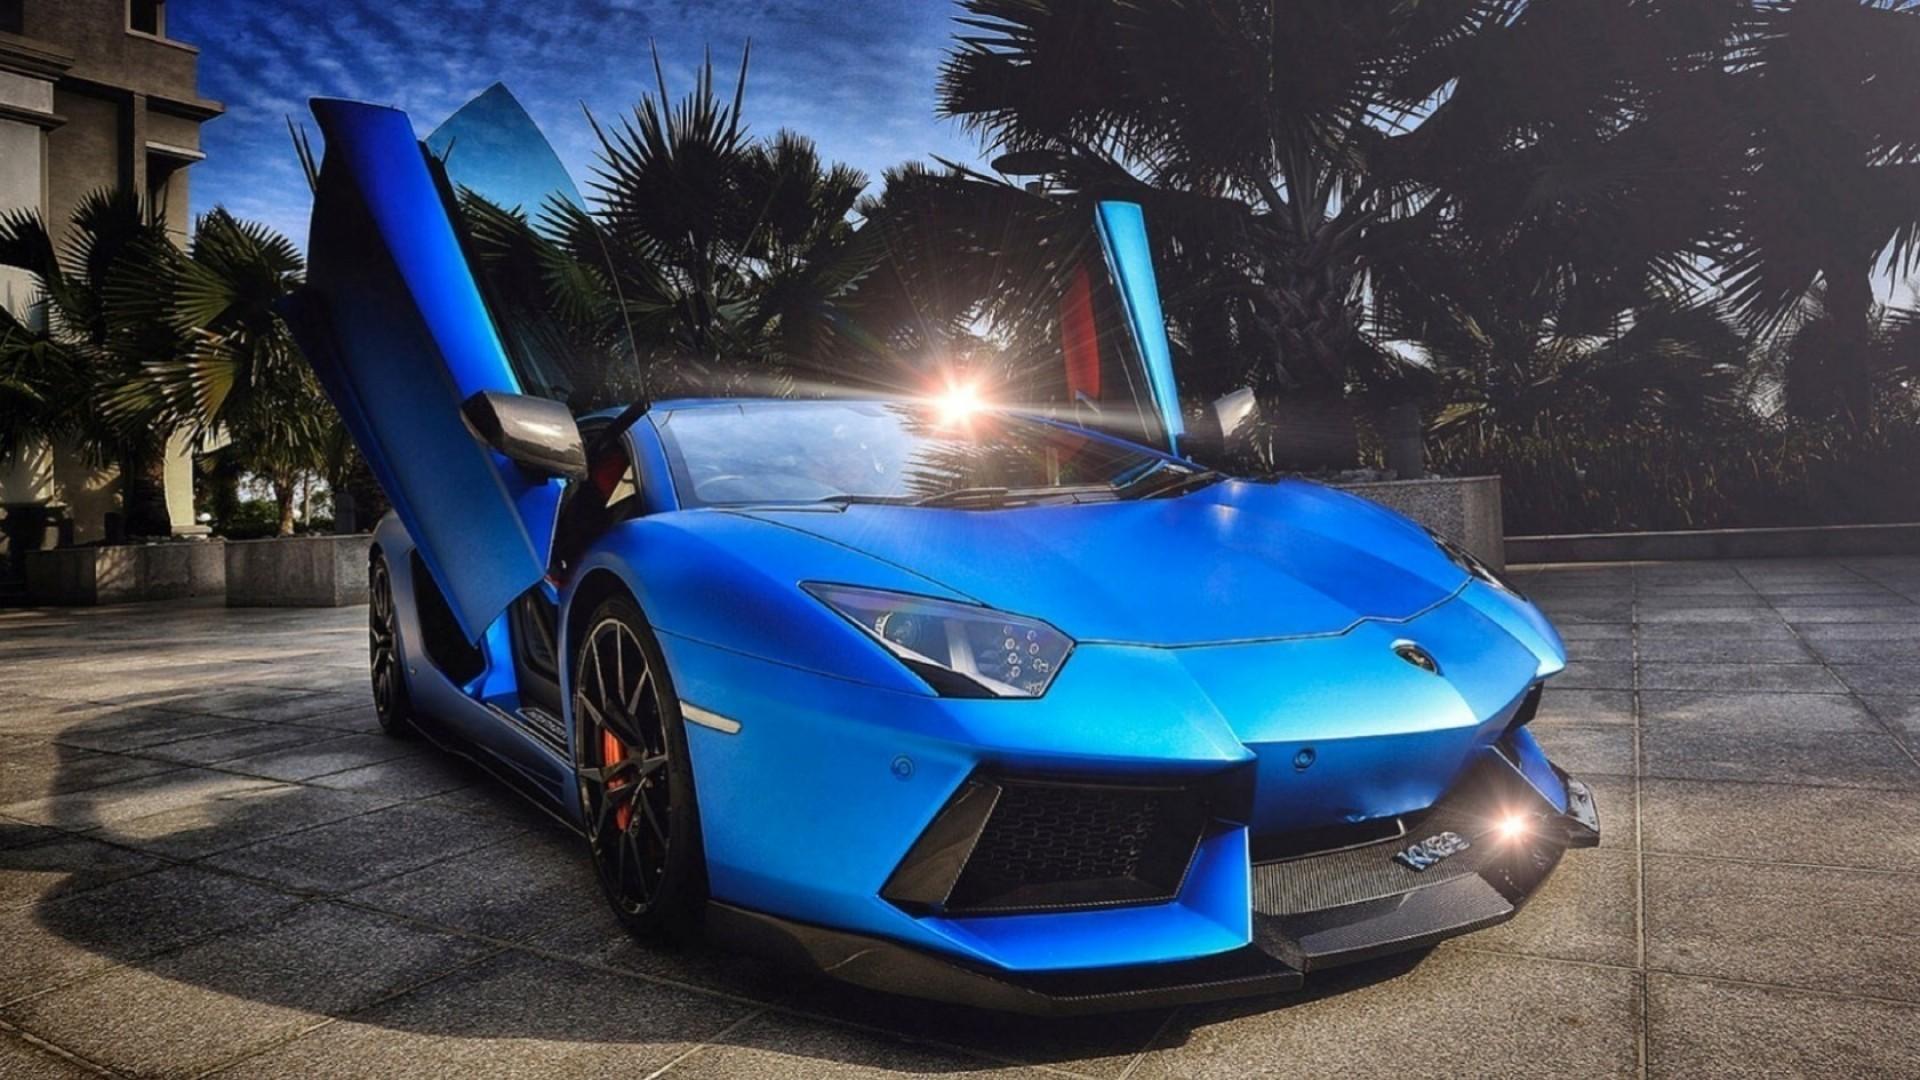 1144 Blue Lamborghini Aventador Wallpaper